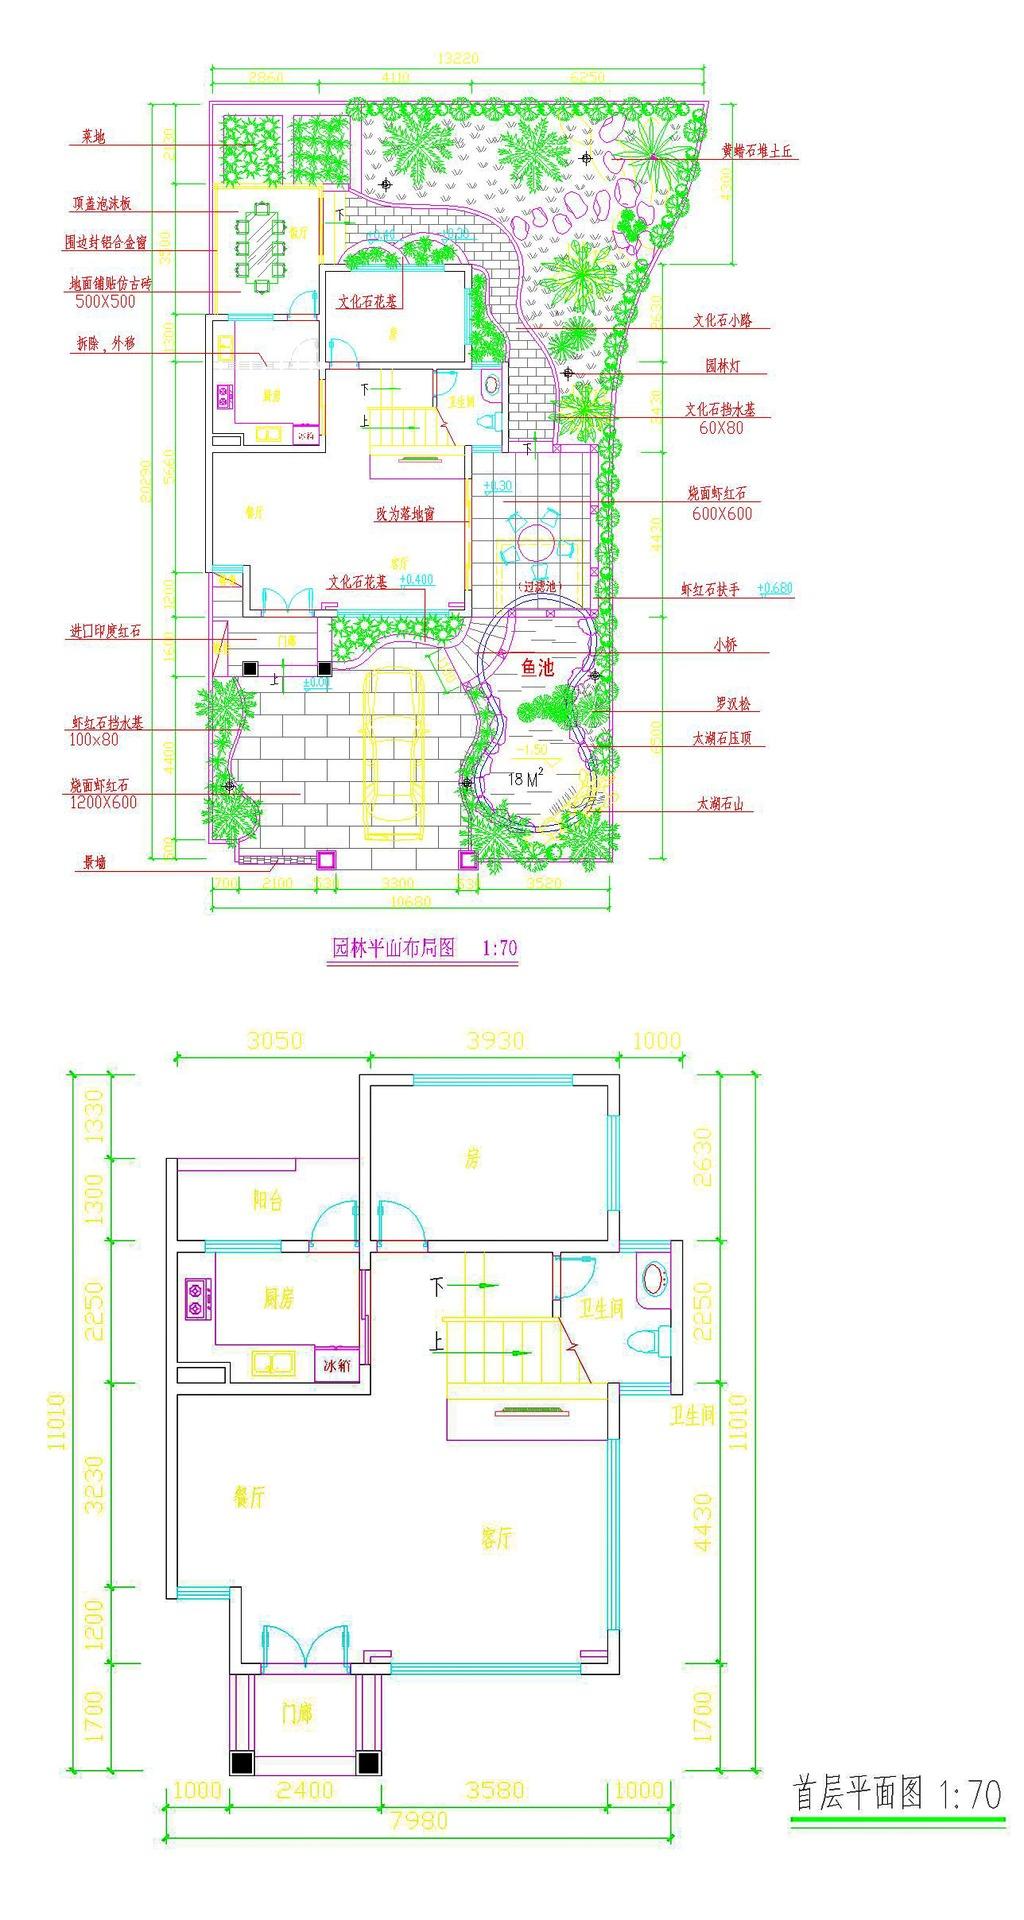 建筑图纸 cad建筑 cad纸图设计